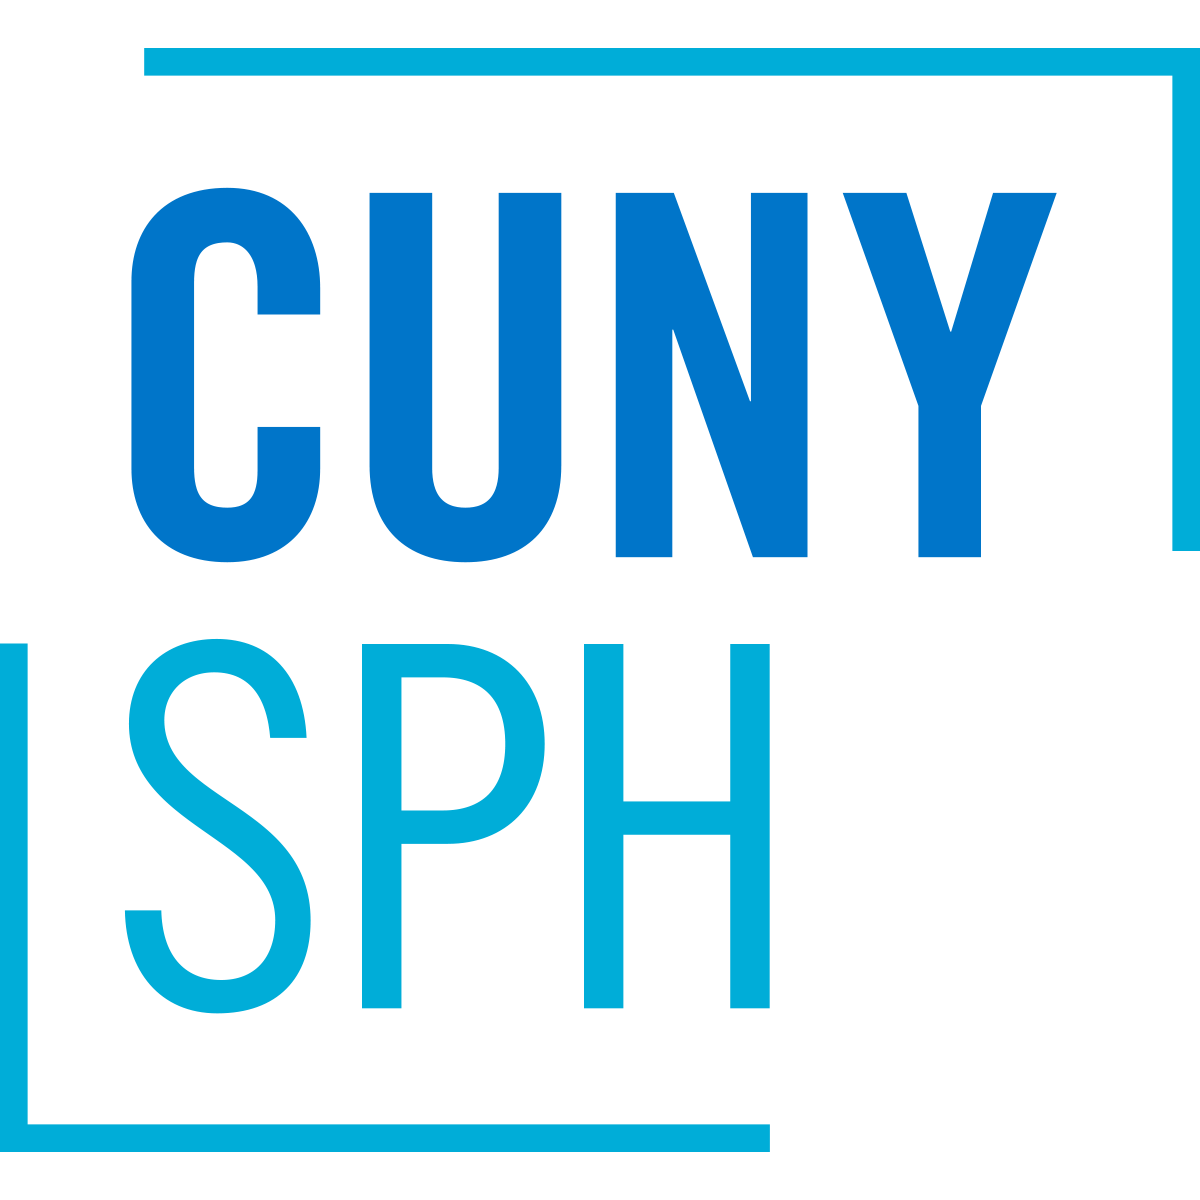 CUNY SPH